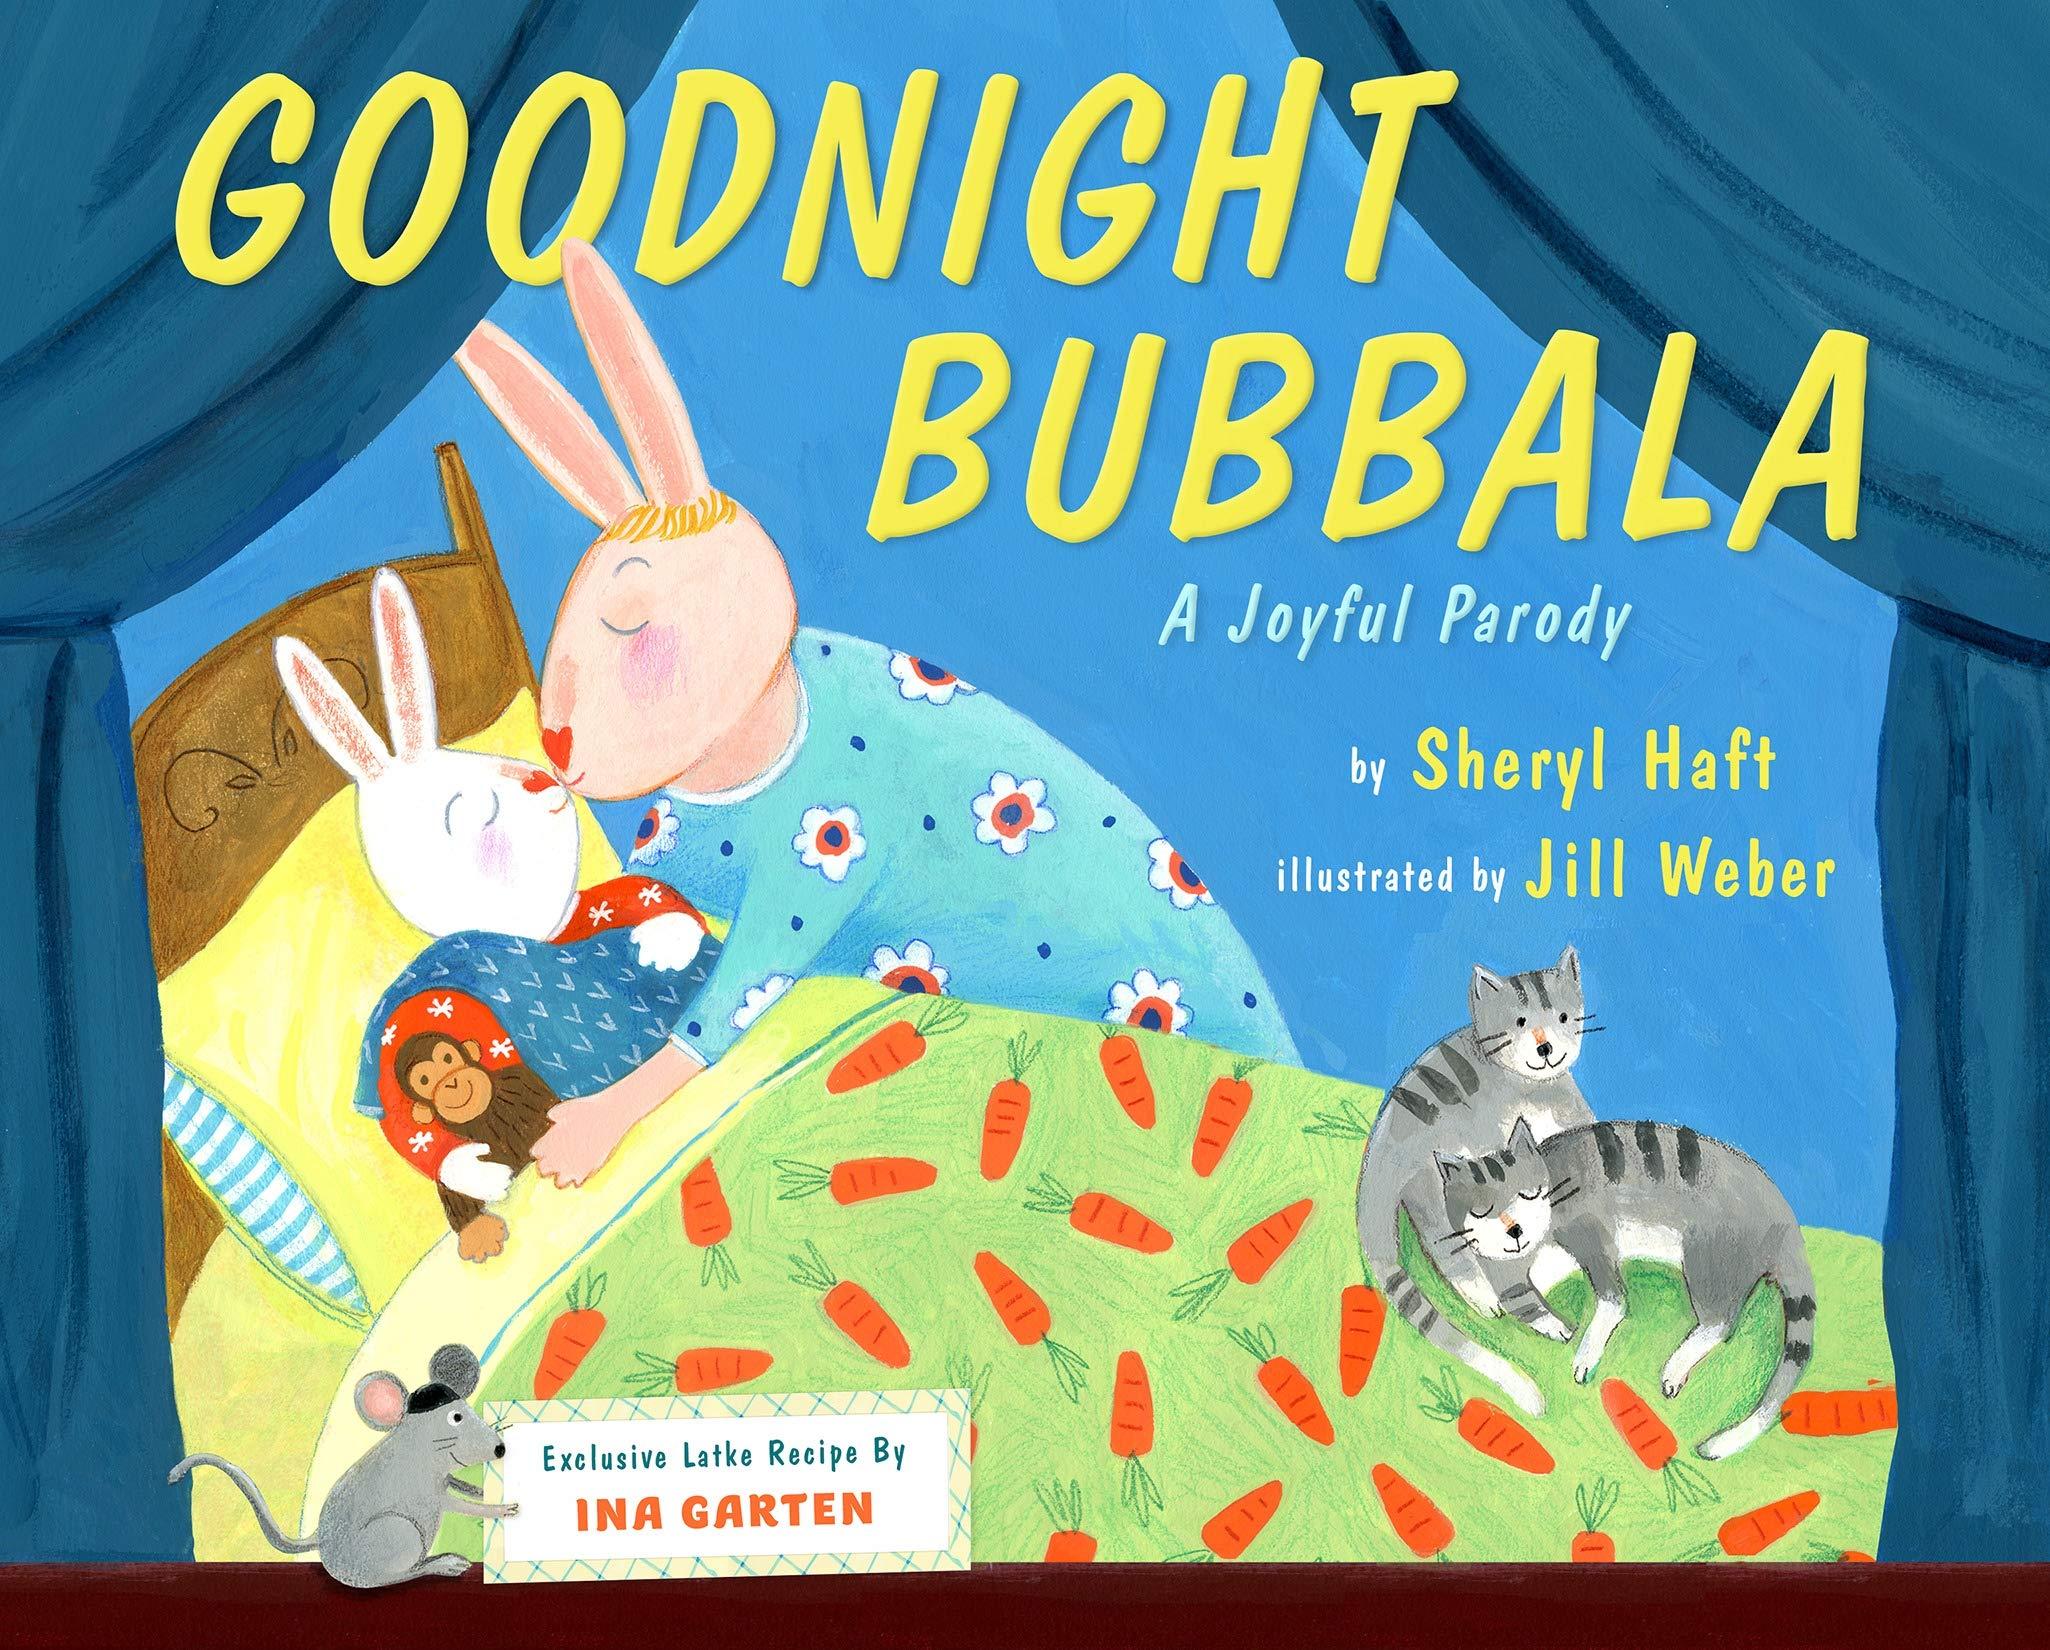 Goodnight bubbala cover